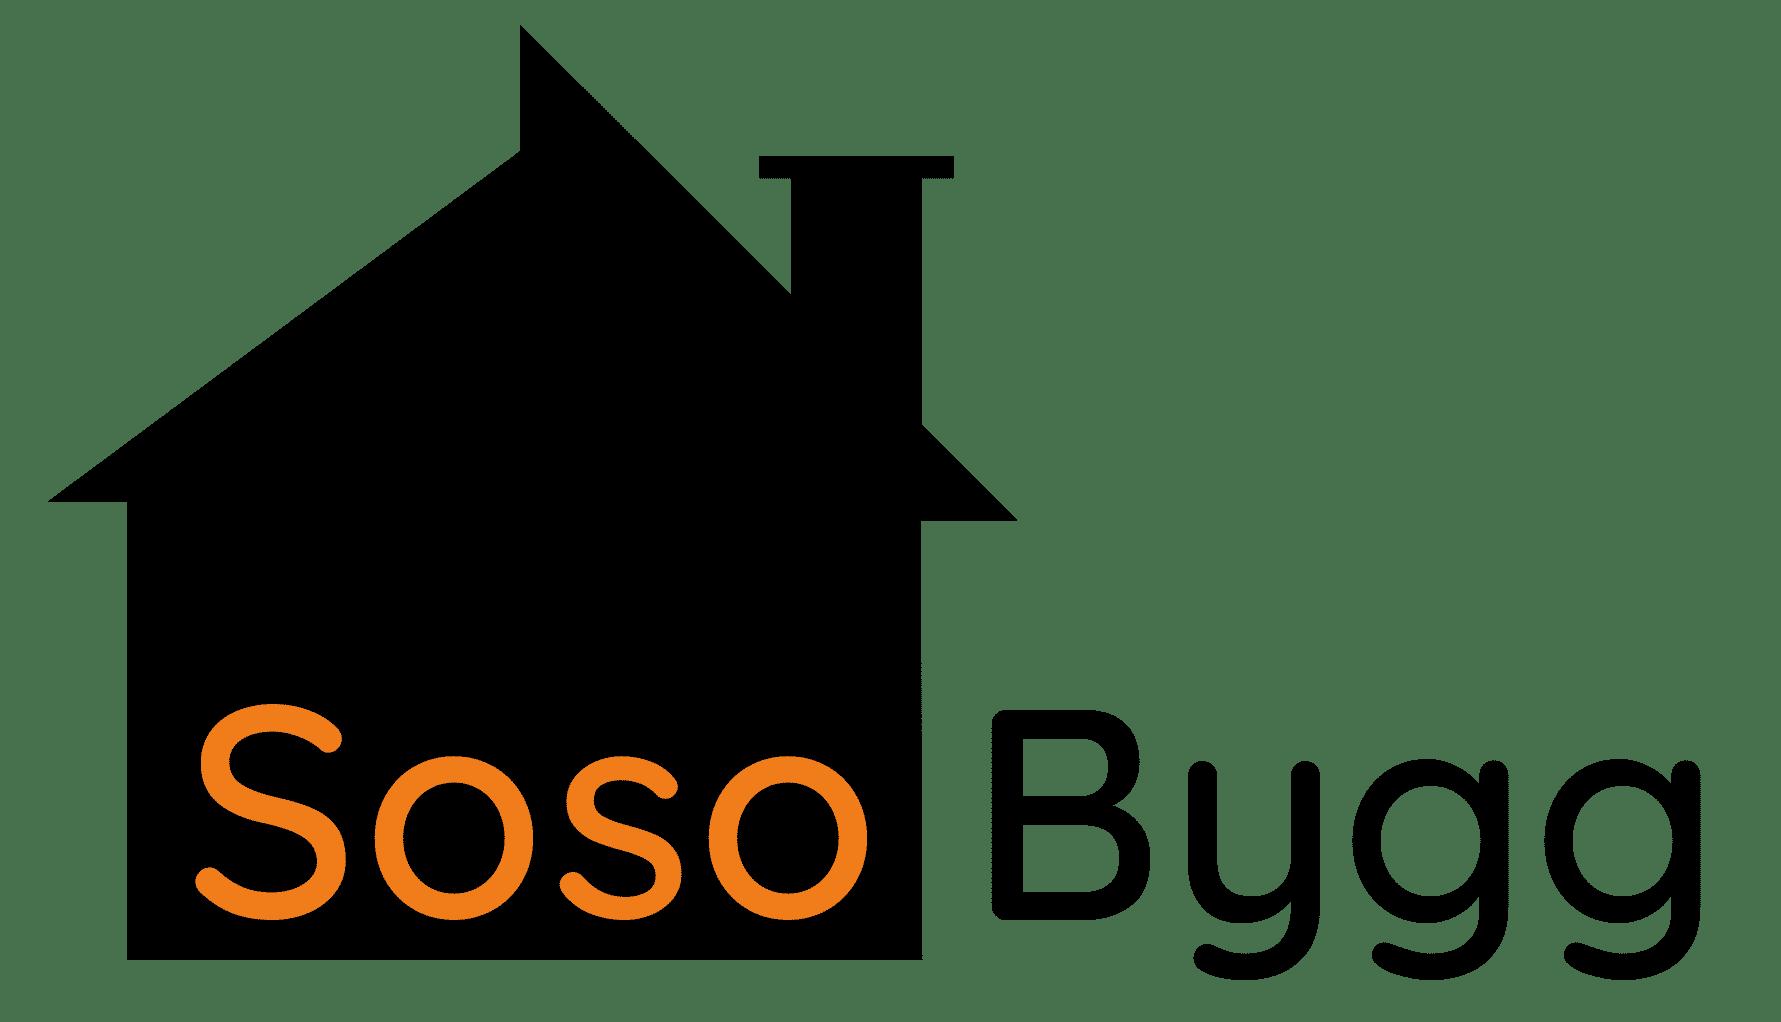 soso bygg logotyp